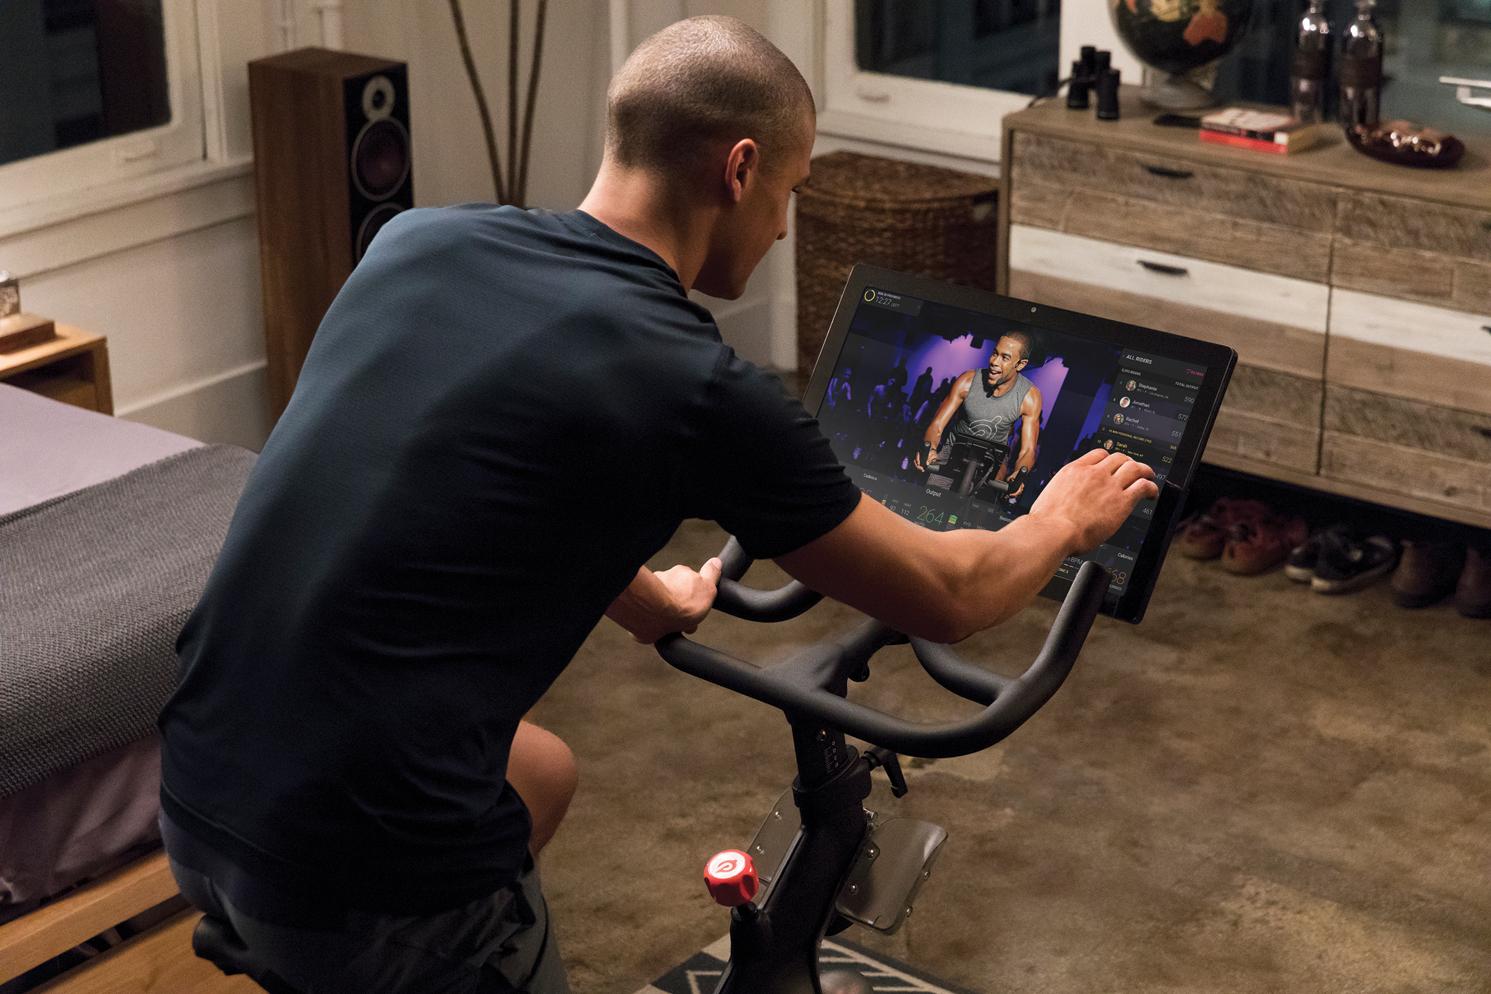 Analysis: Swotting up on fitness